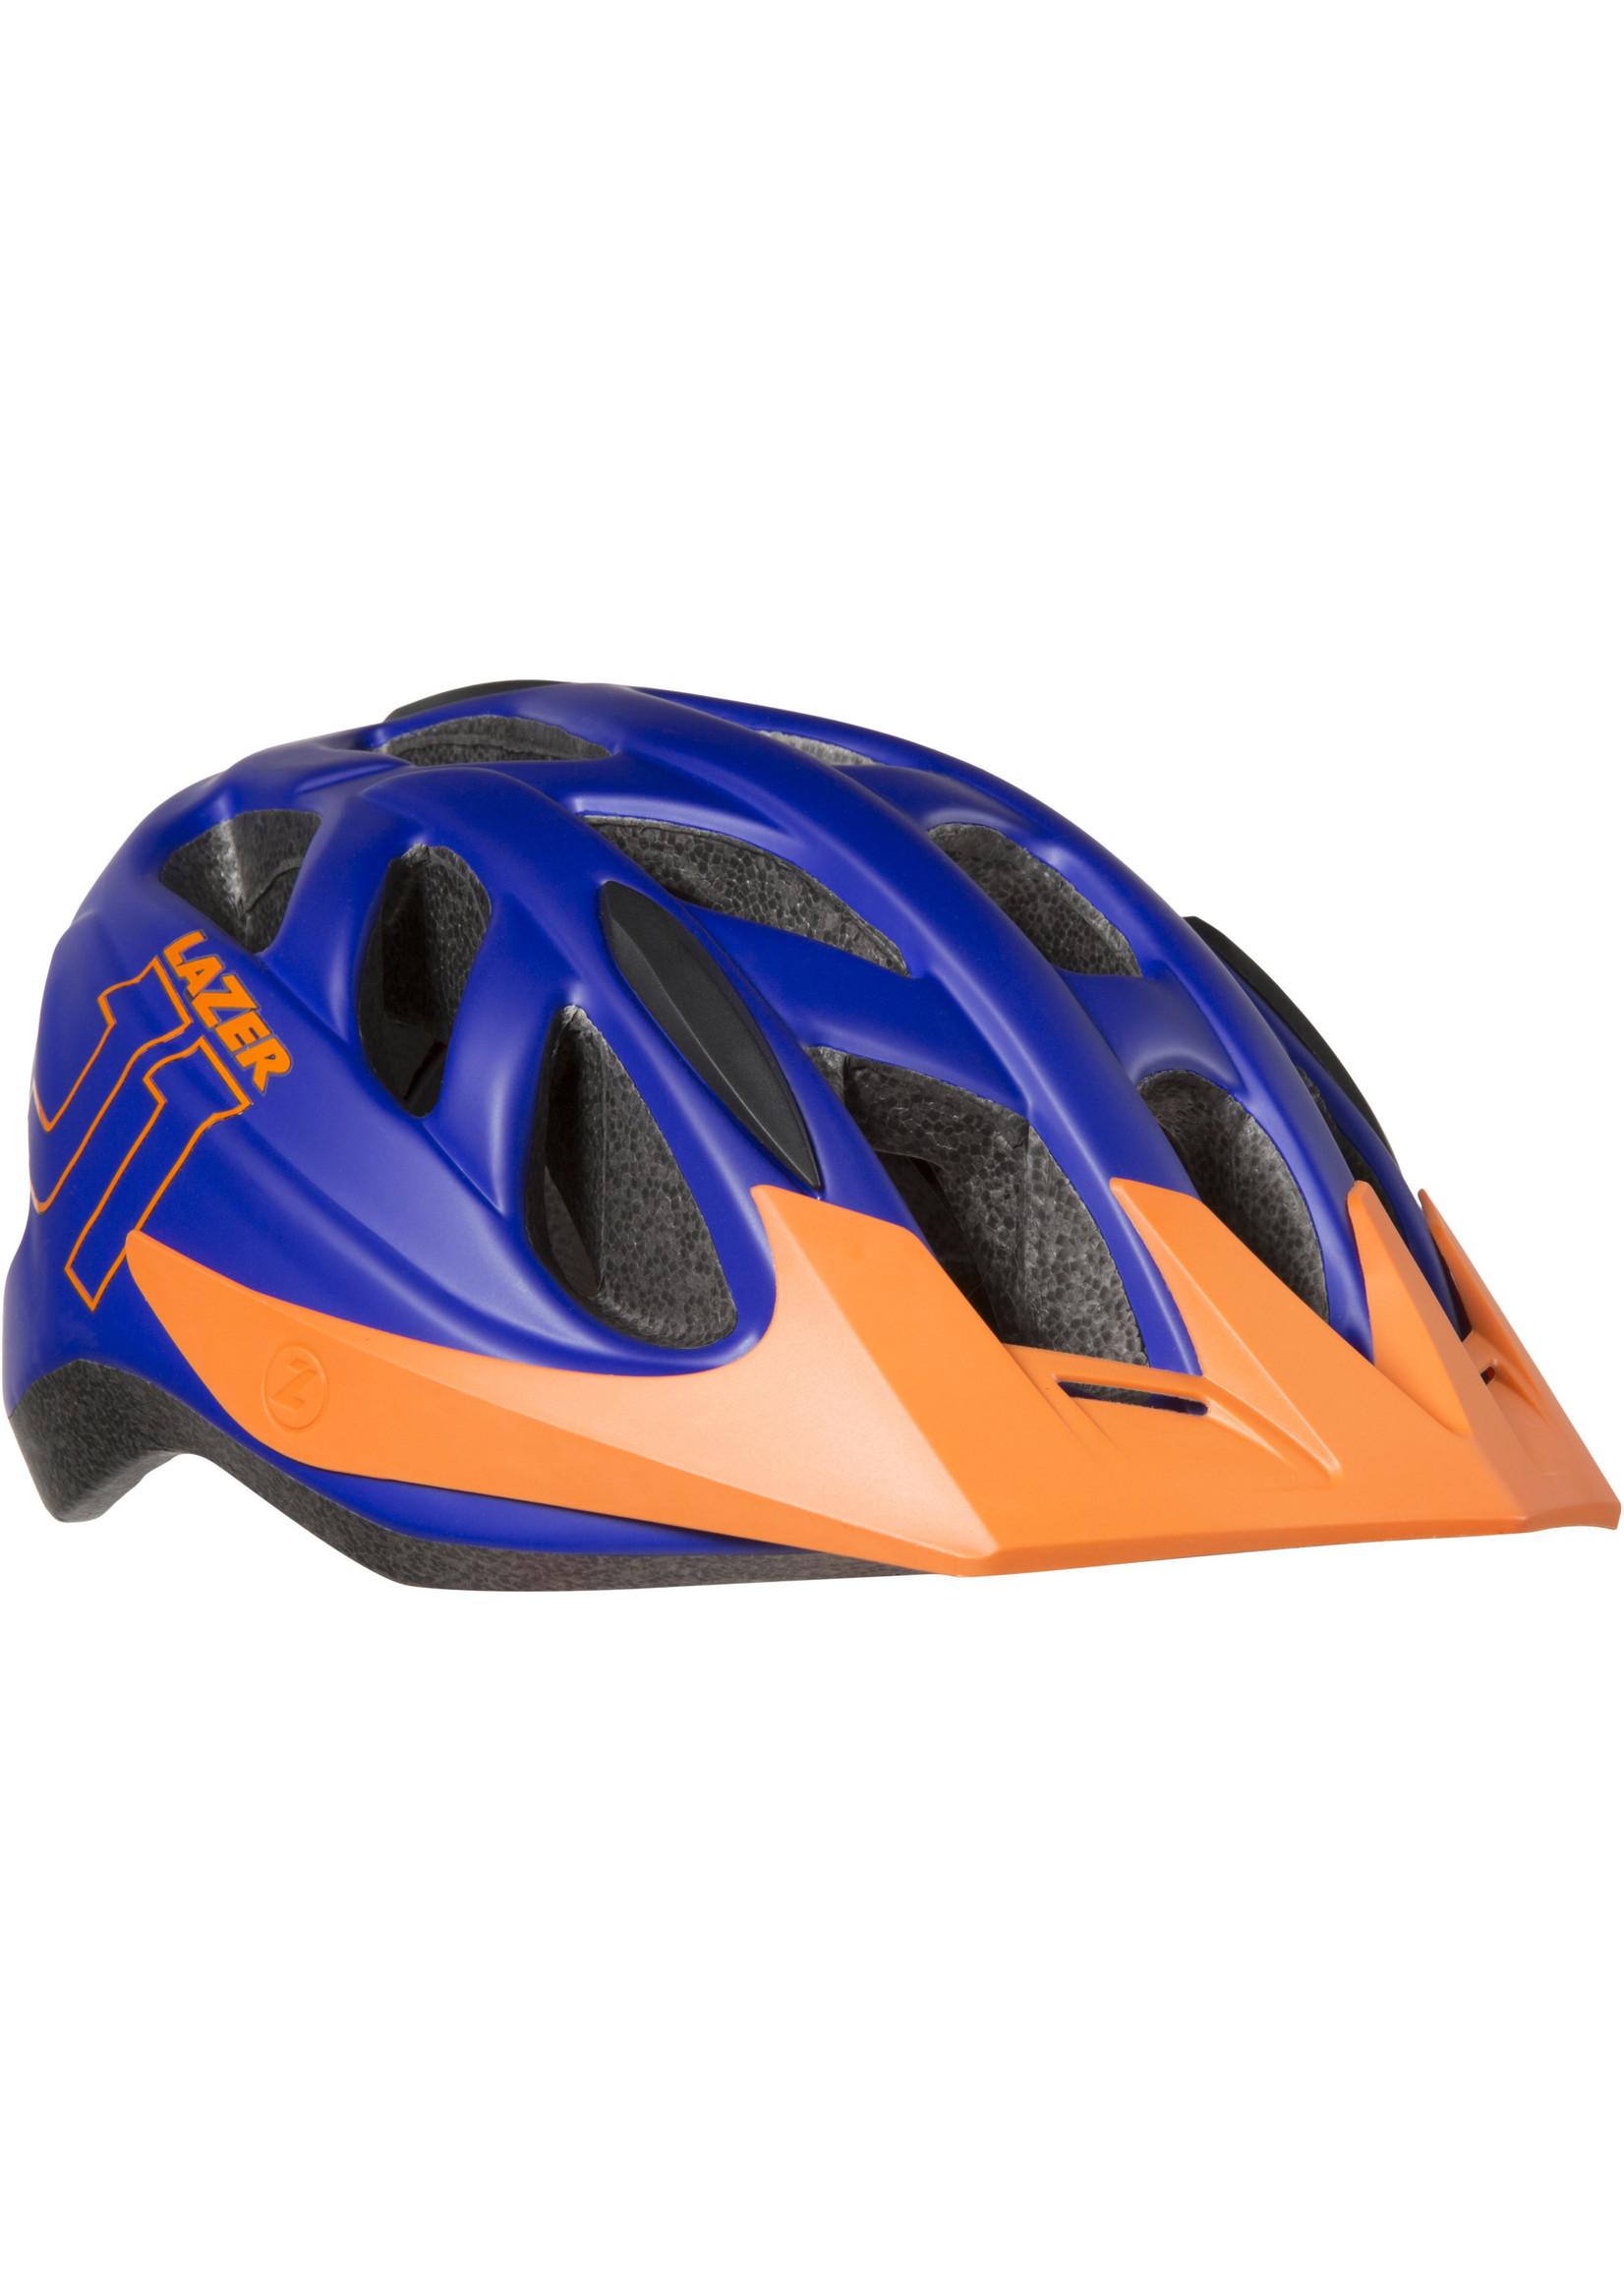 Lazer J1 Helmet, Blue/Orange, Uni-Youth